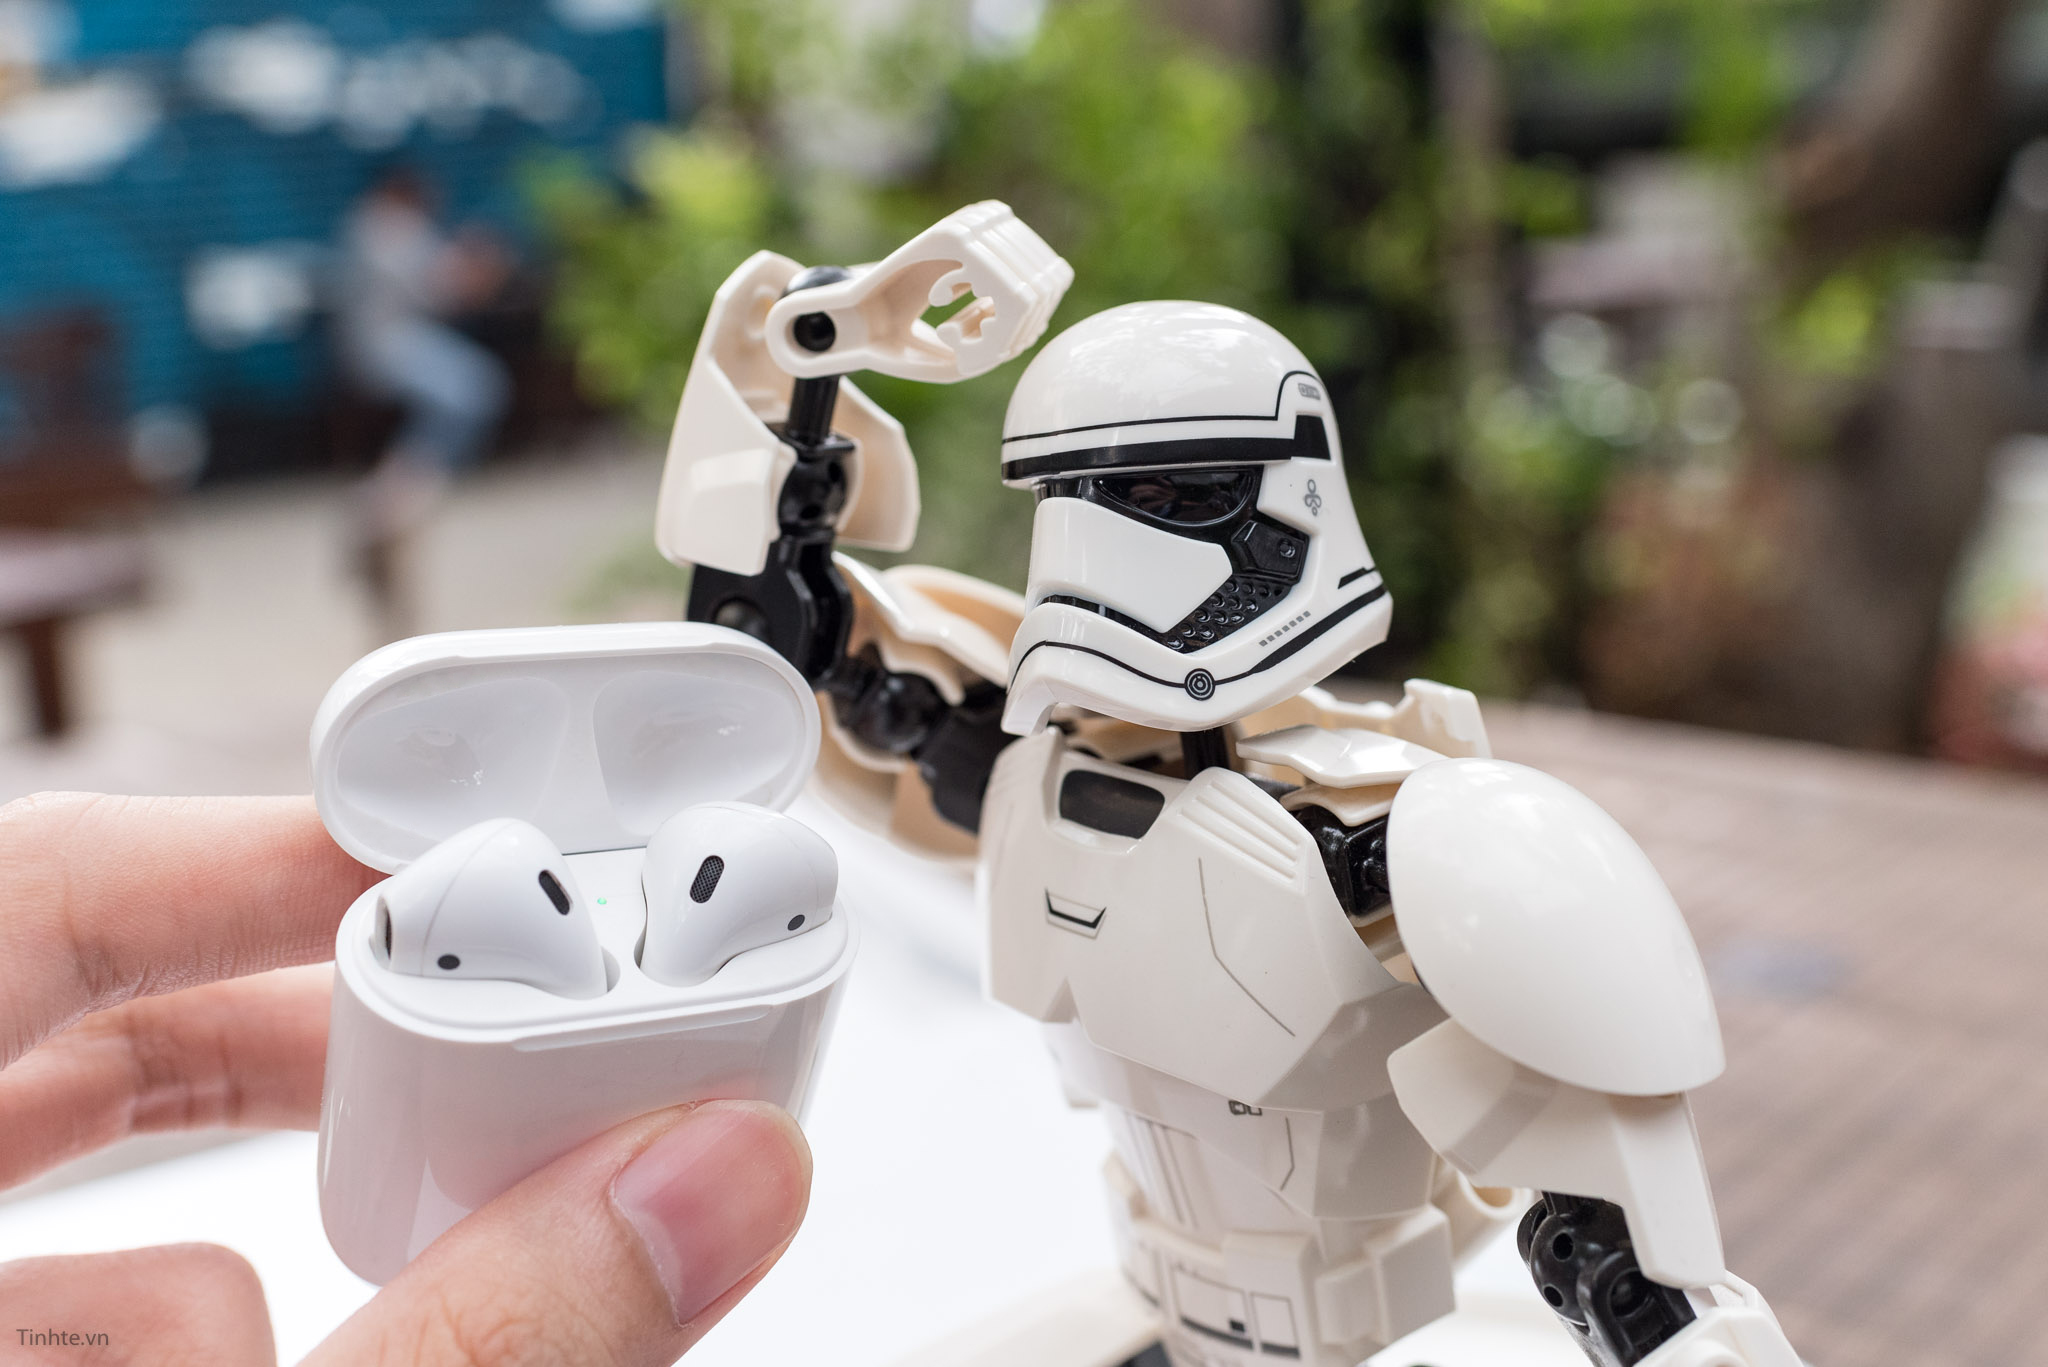 tinhte_airpods-stormtrooper-tinhte-1.jpg